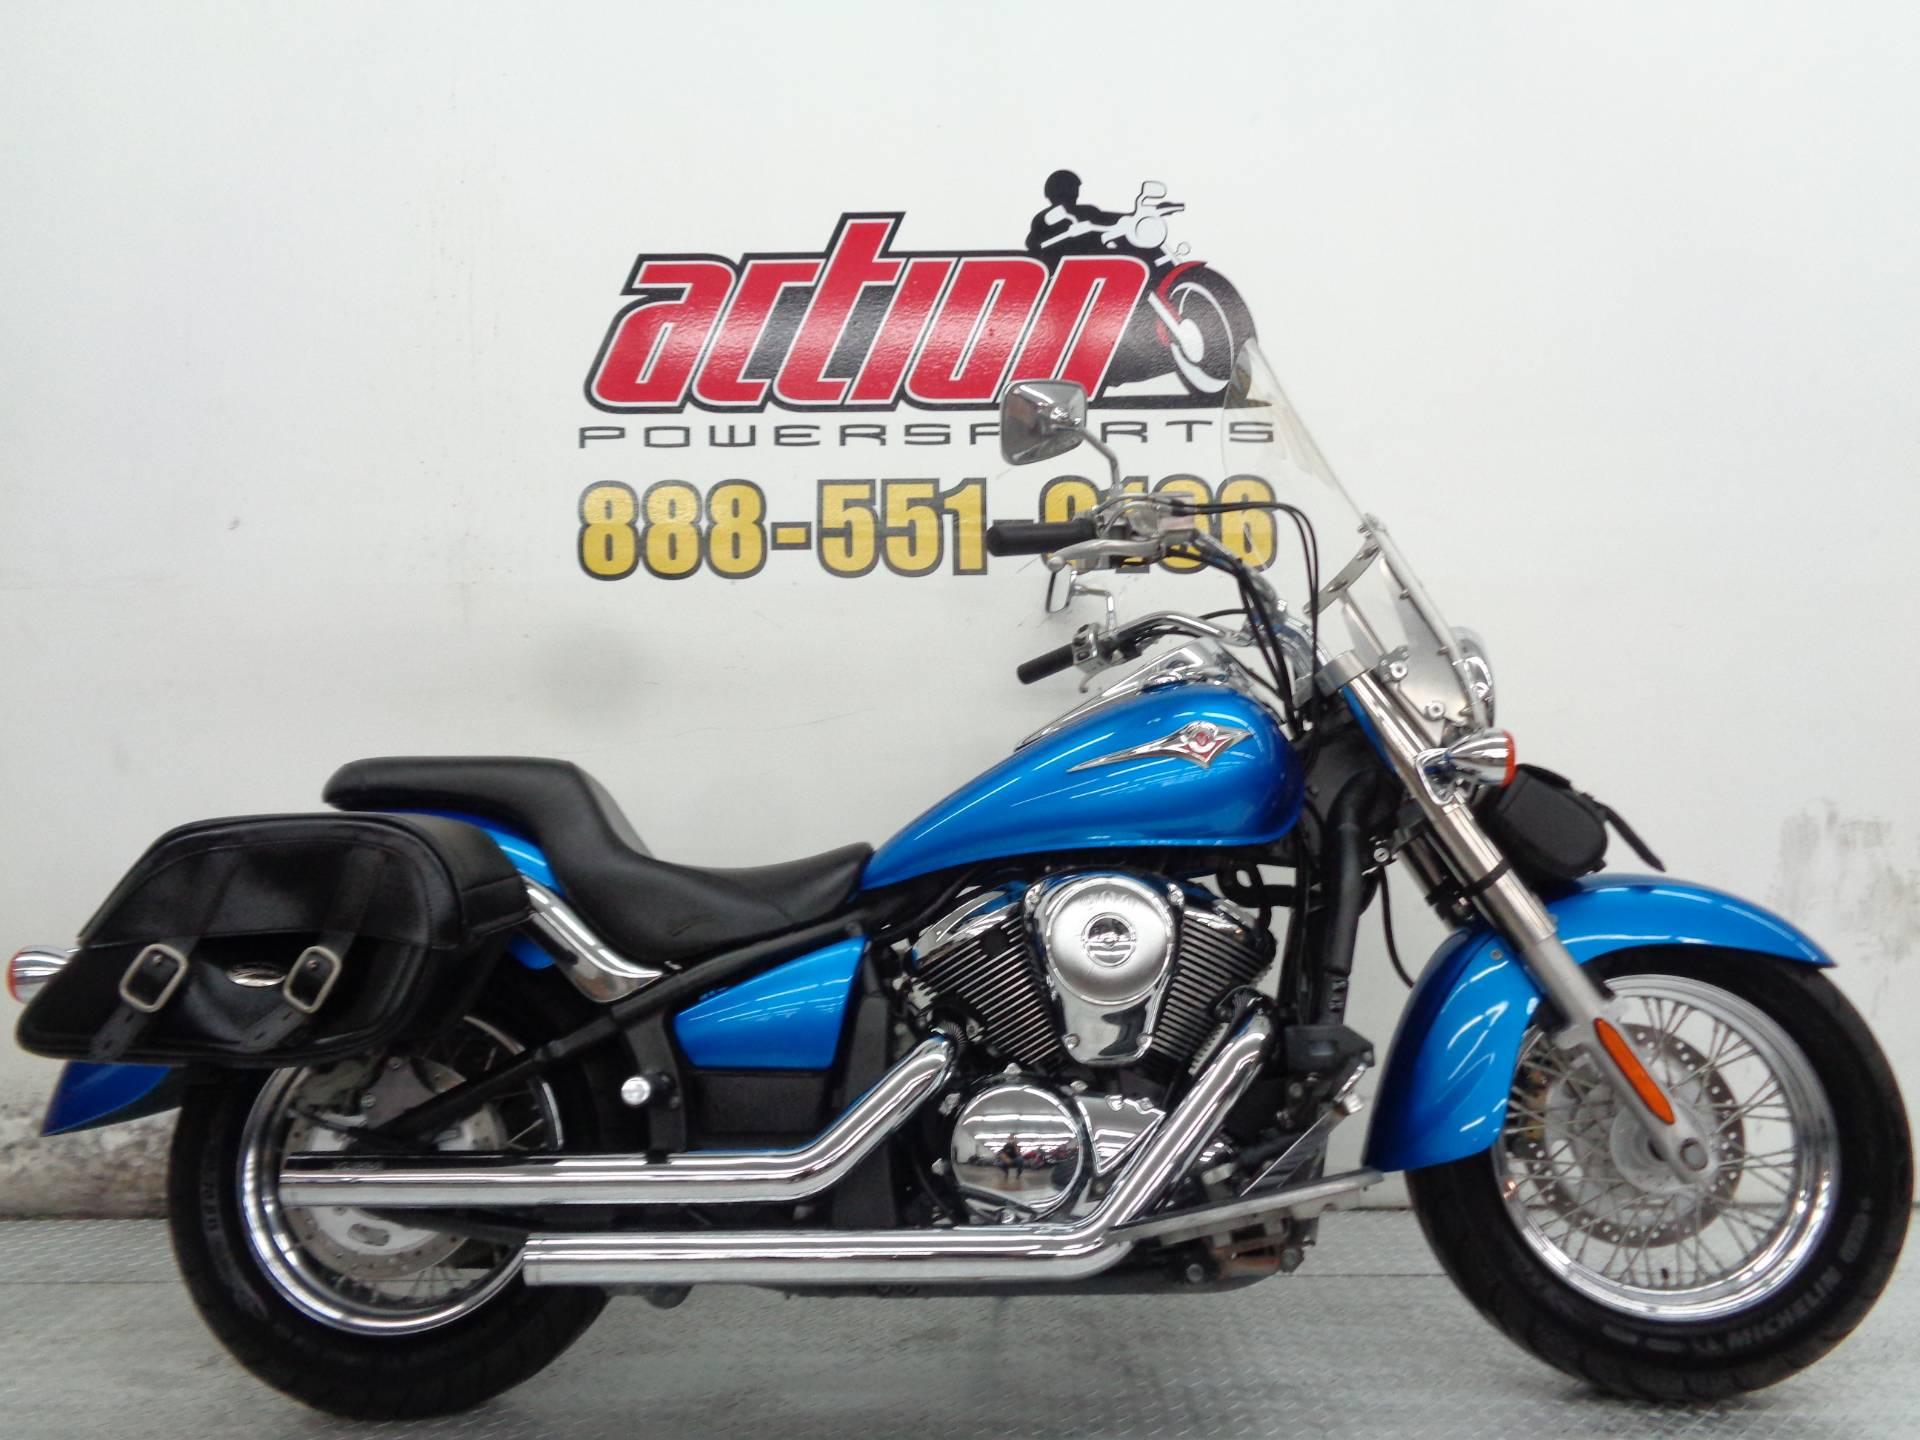 Used 2009 Kawasaki Vulcan® 900 Classic Motorcycles in Tulsa, OK ...